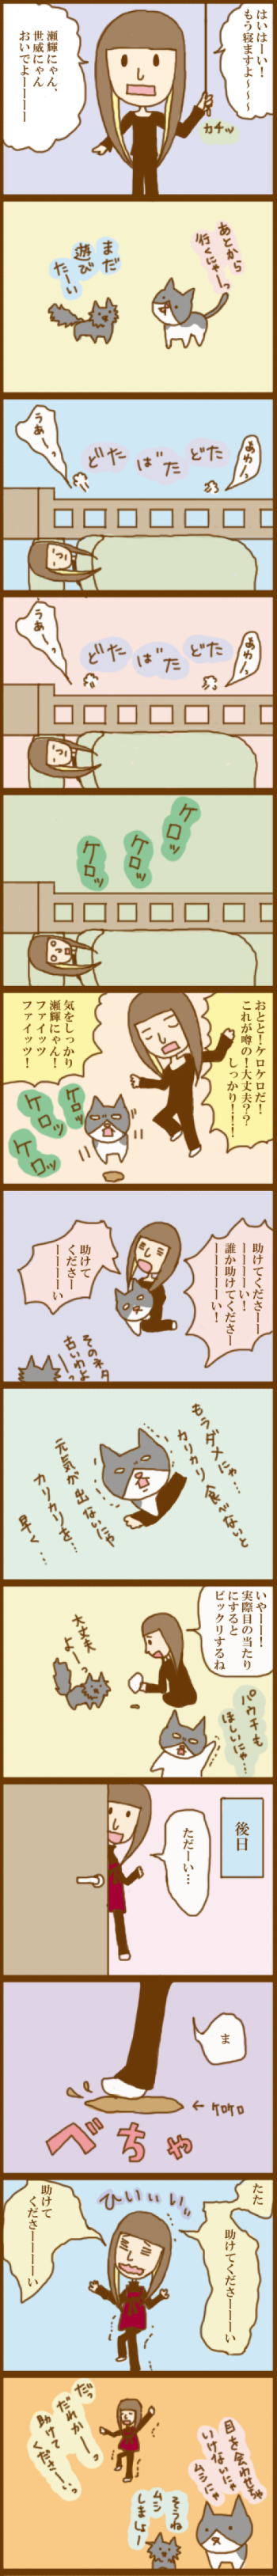 f:id:suzuokayu:20201017212902j:plain